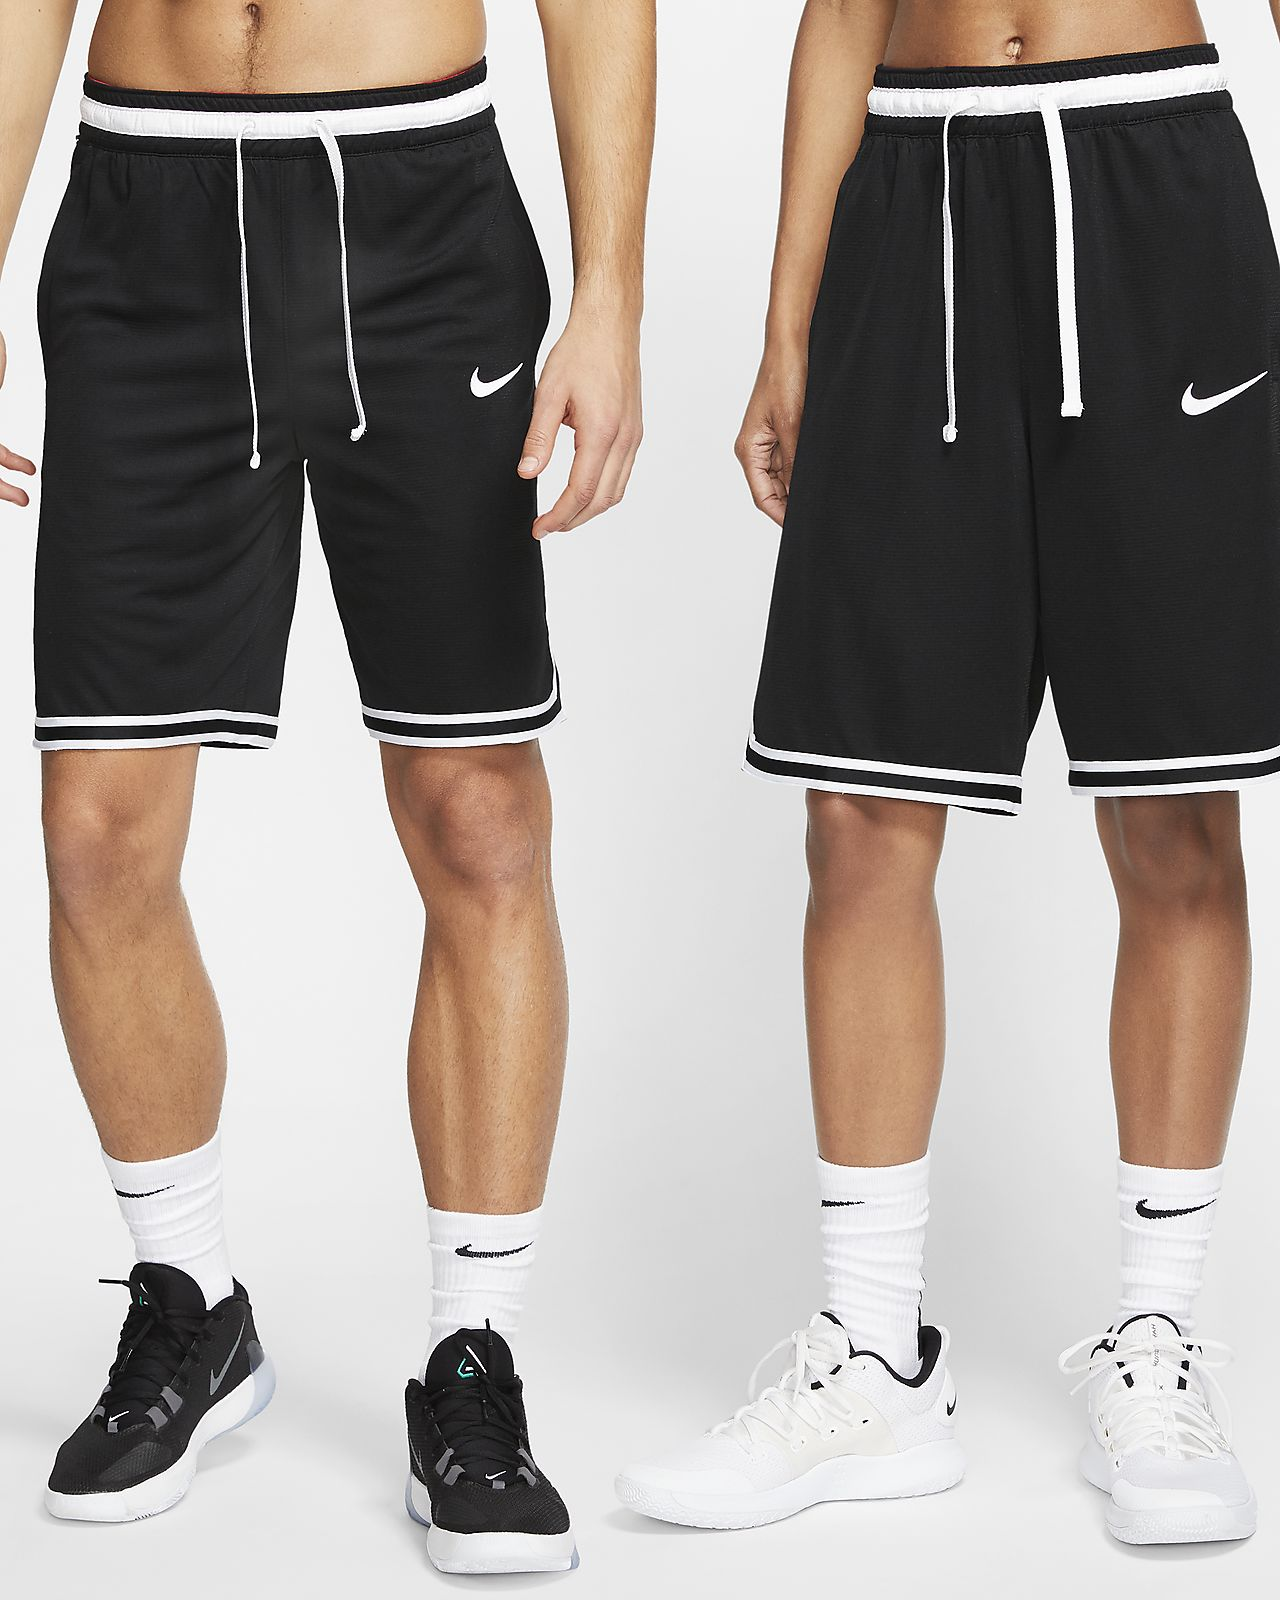 Nike Dri-FIT DNA Pantalons curts de bàsquet - Home